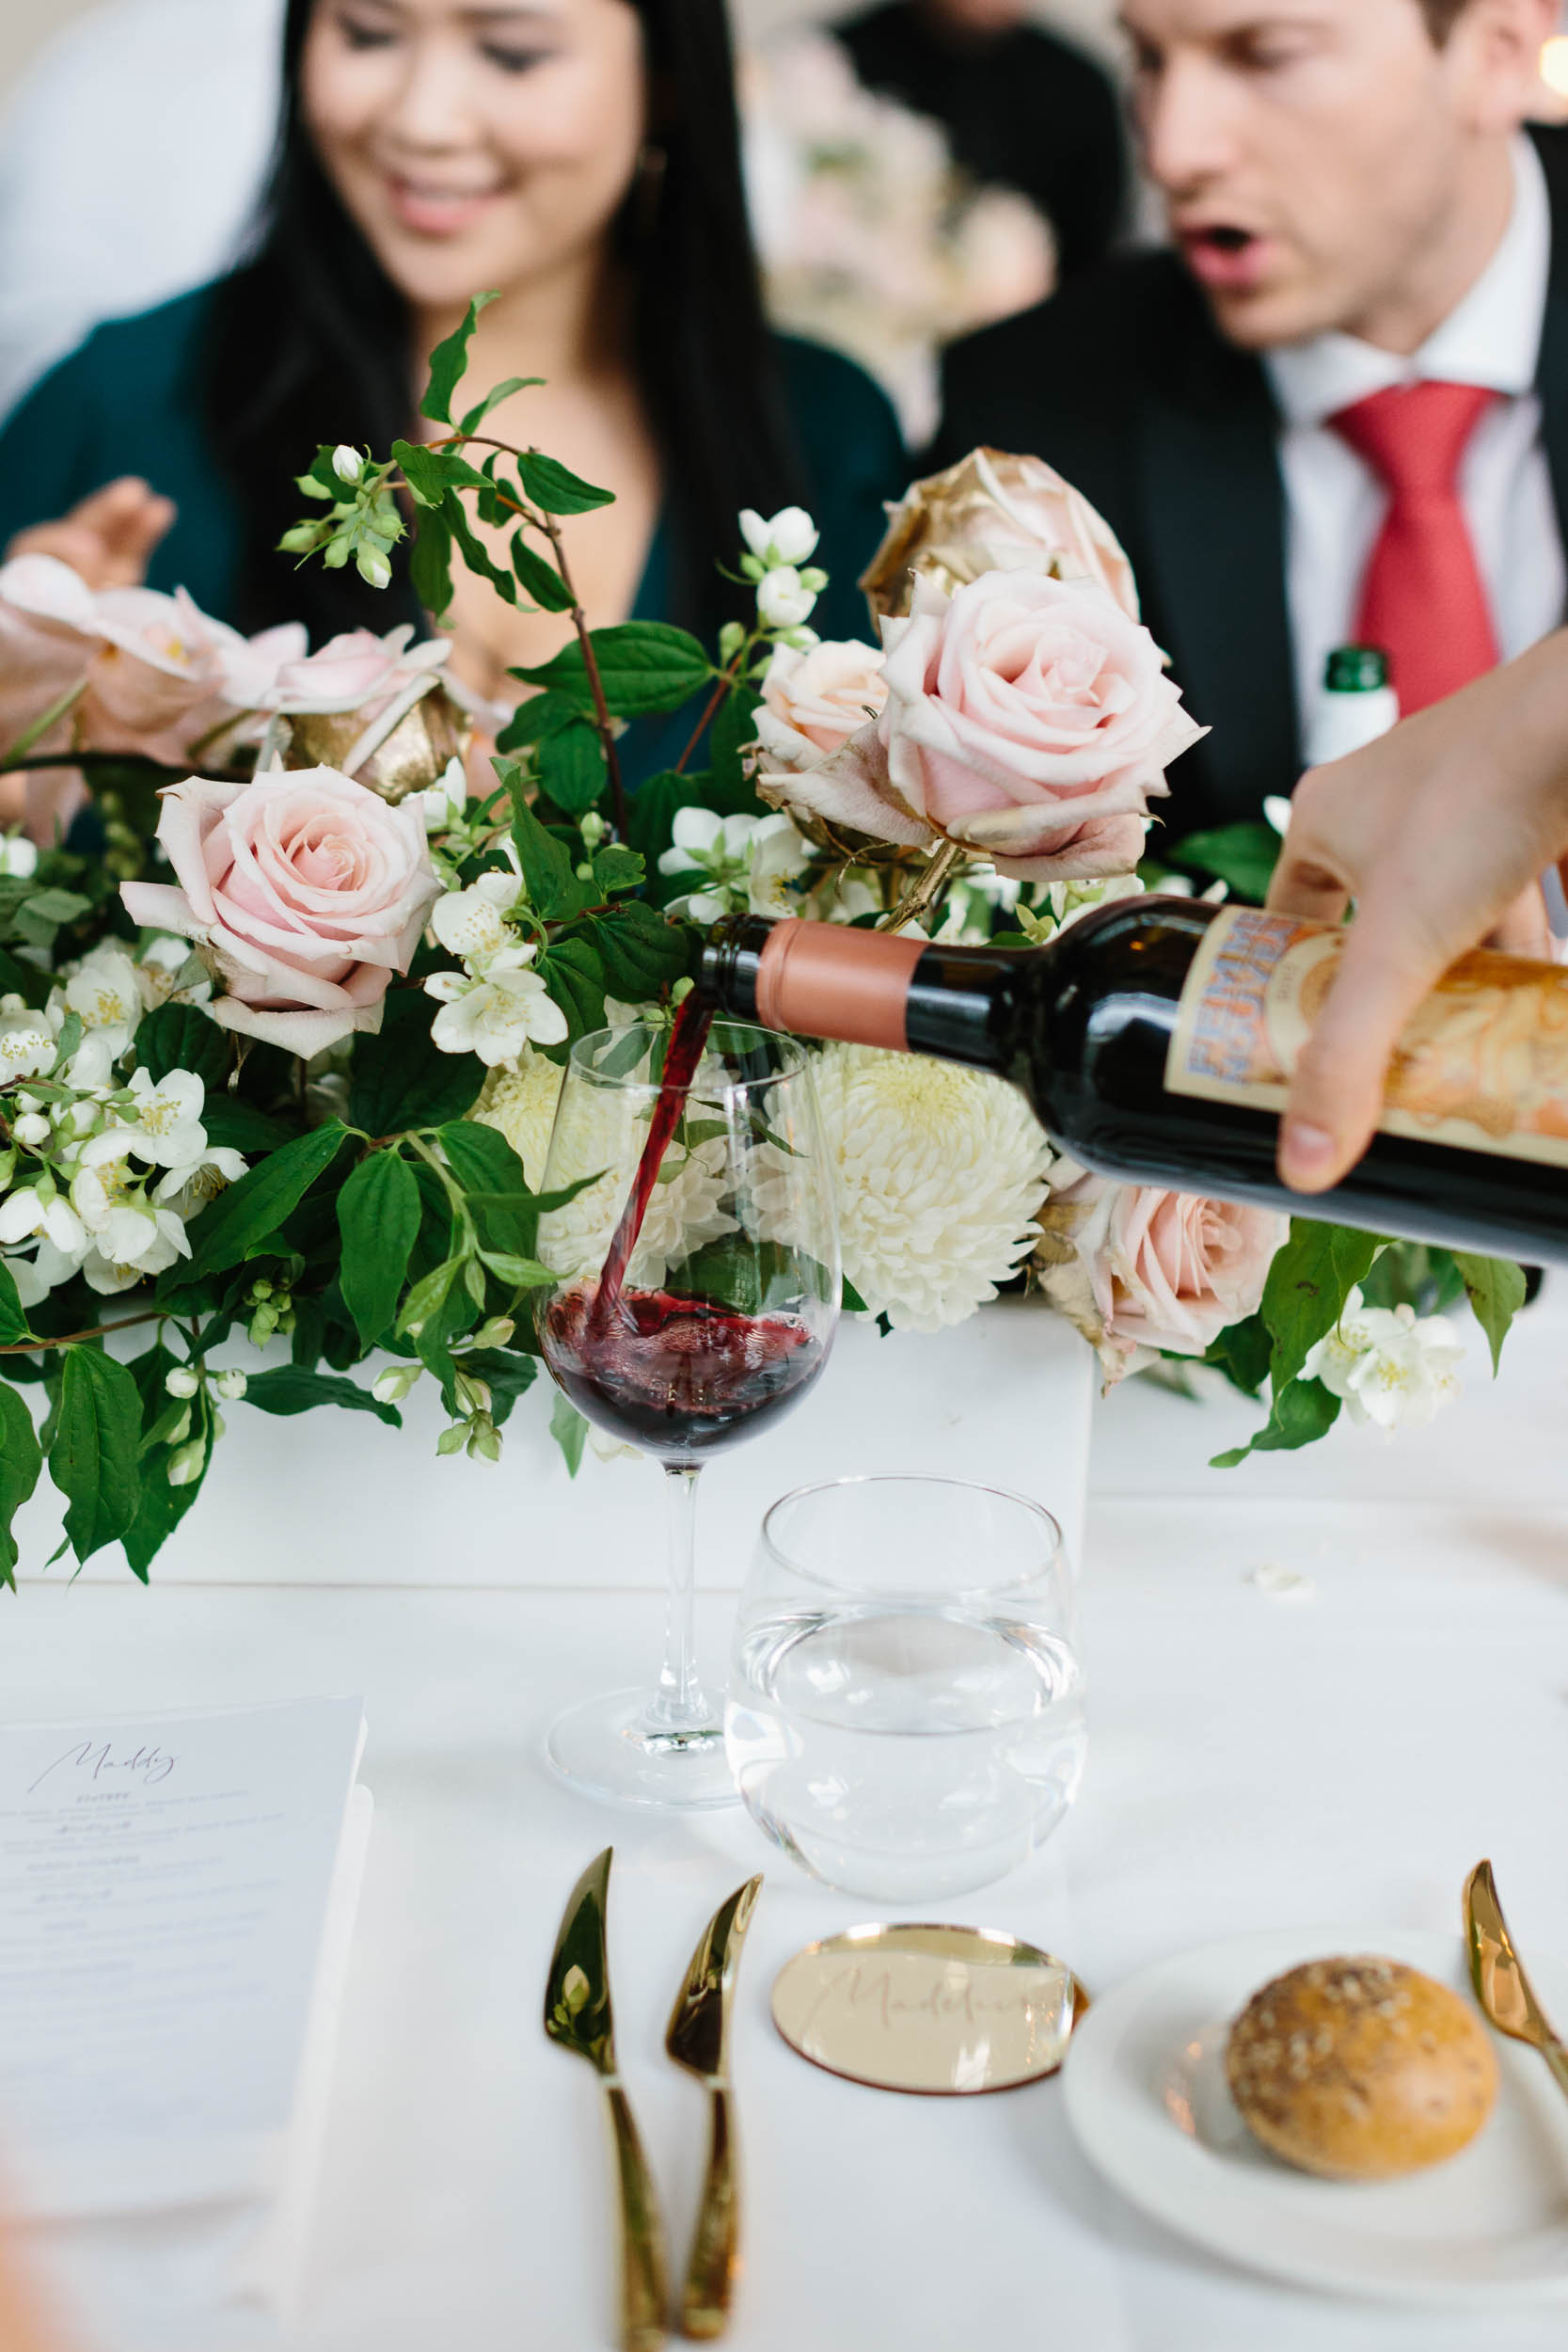 Kas-Richards-Wedding-Photographer-Melbourne-City-Wedding-Alto-Event-Space-Jane-Hill-Bridal-Gown-57.jpg